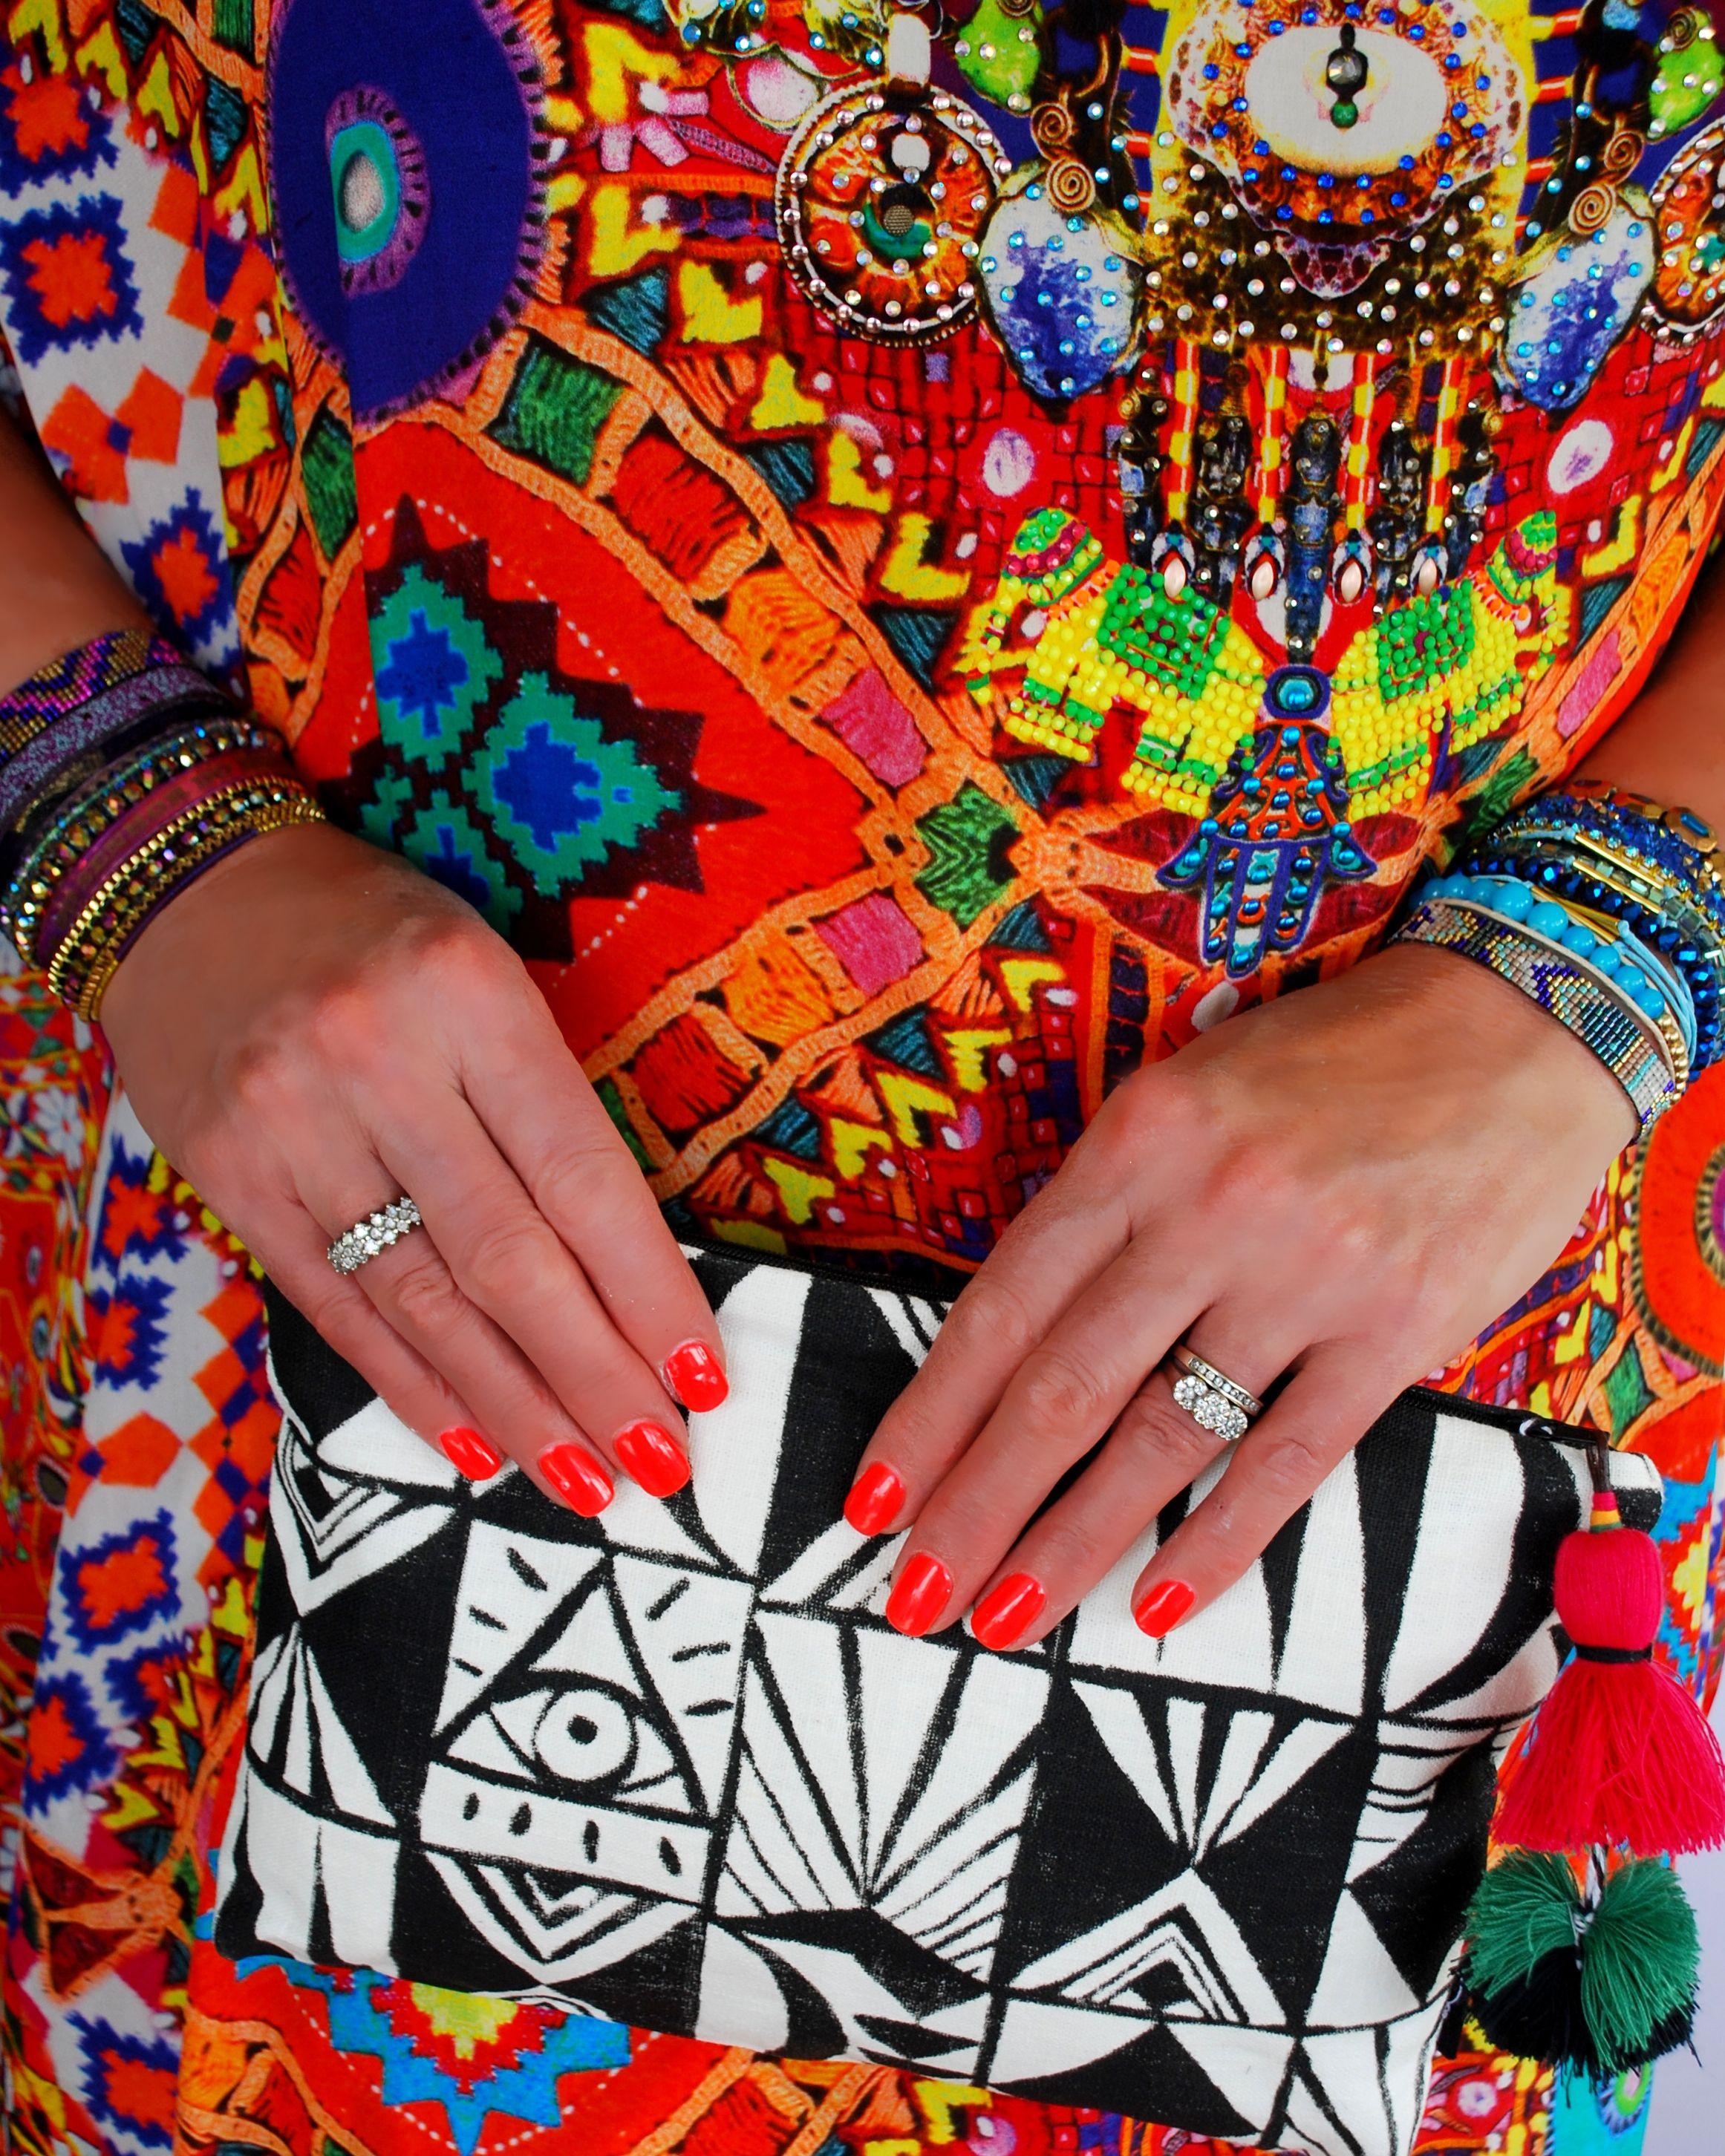 Ses + Jen - The Store, Ourlieu Clutch and Hipanema bracelets available online now